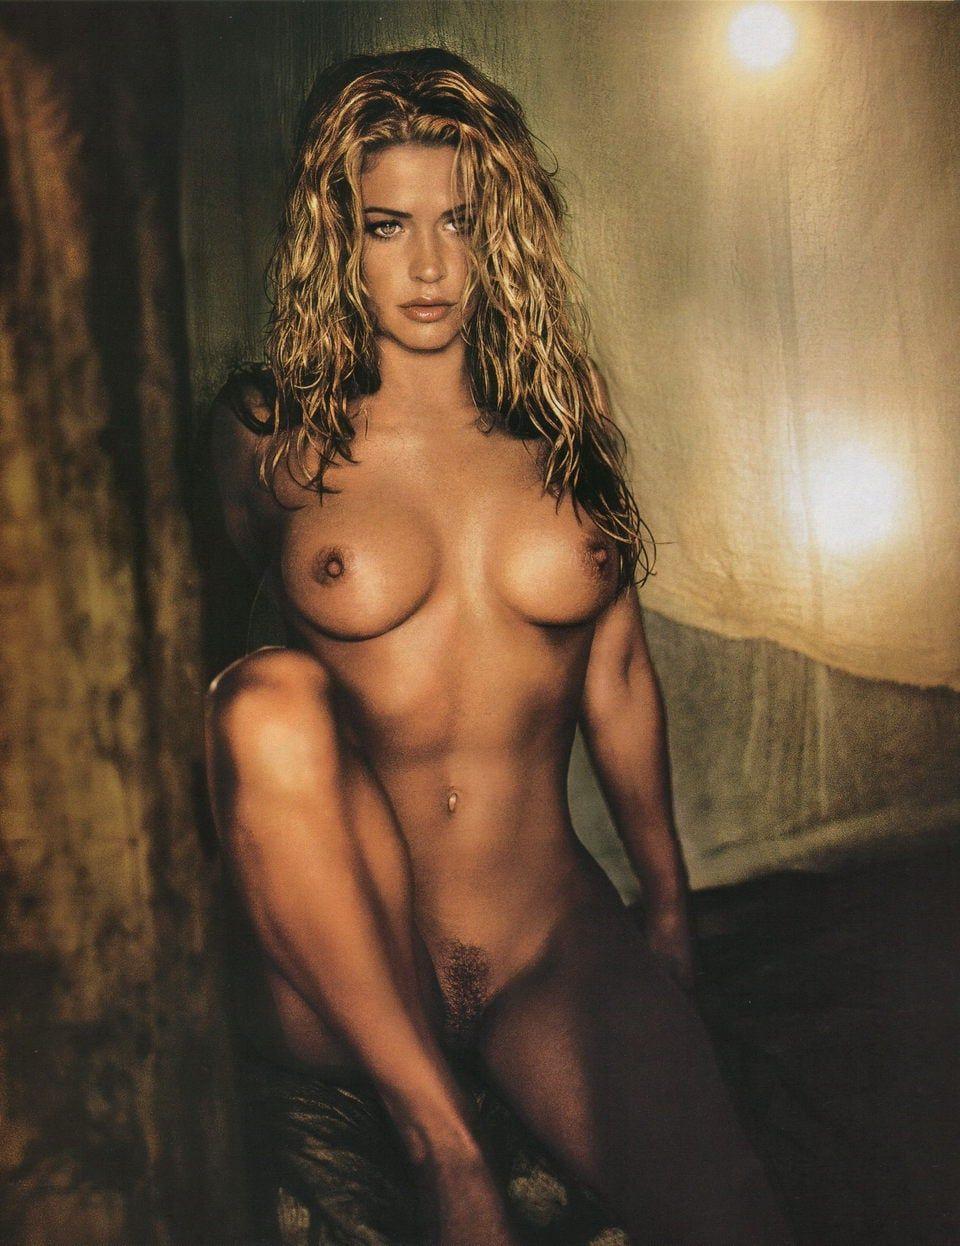 Kristy swanson nude pics photos